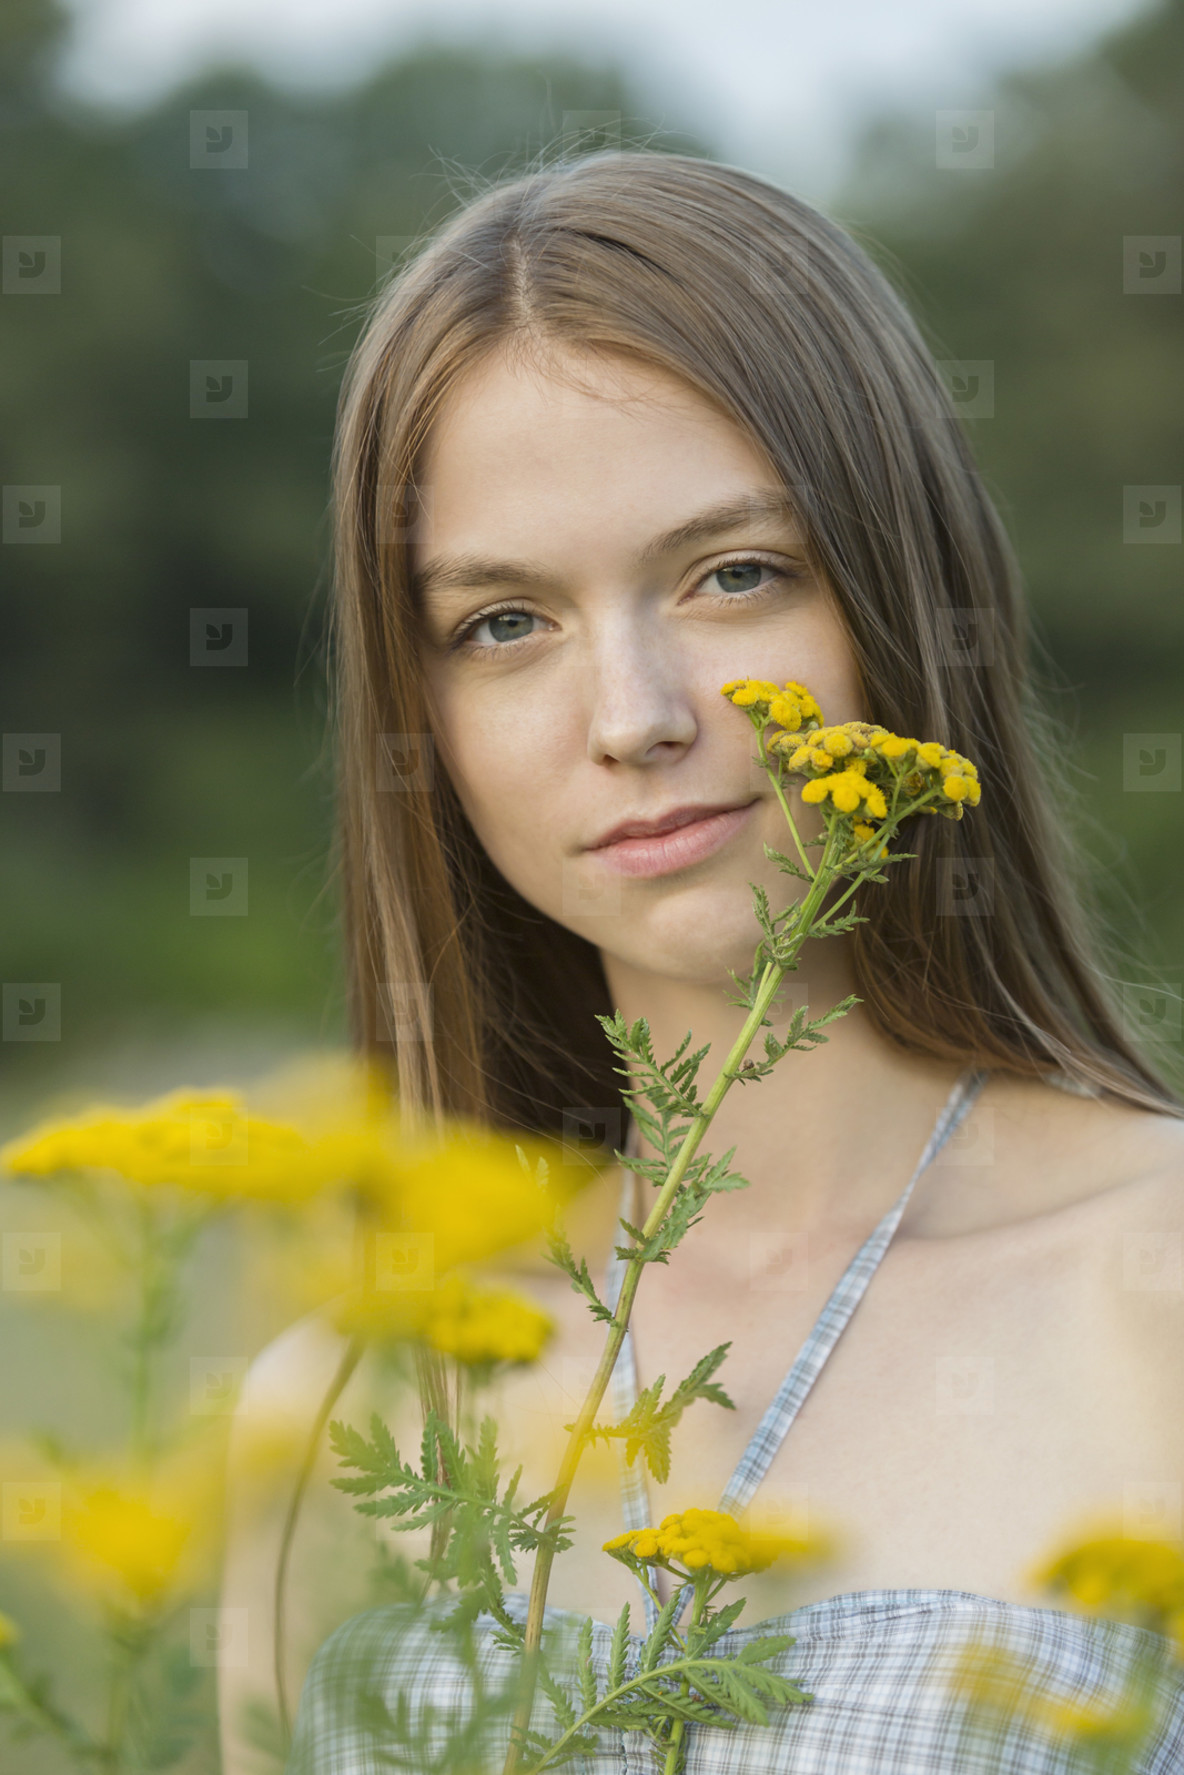 Daisy Daze  21